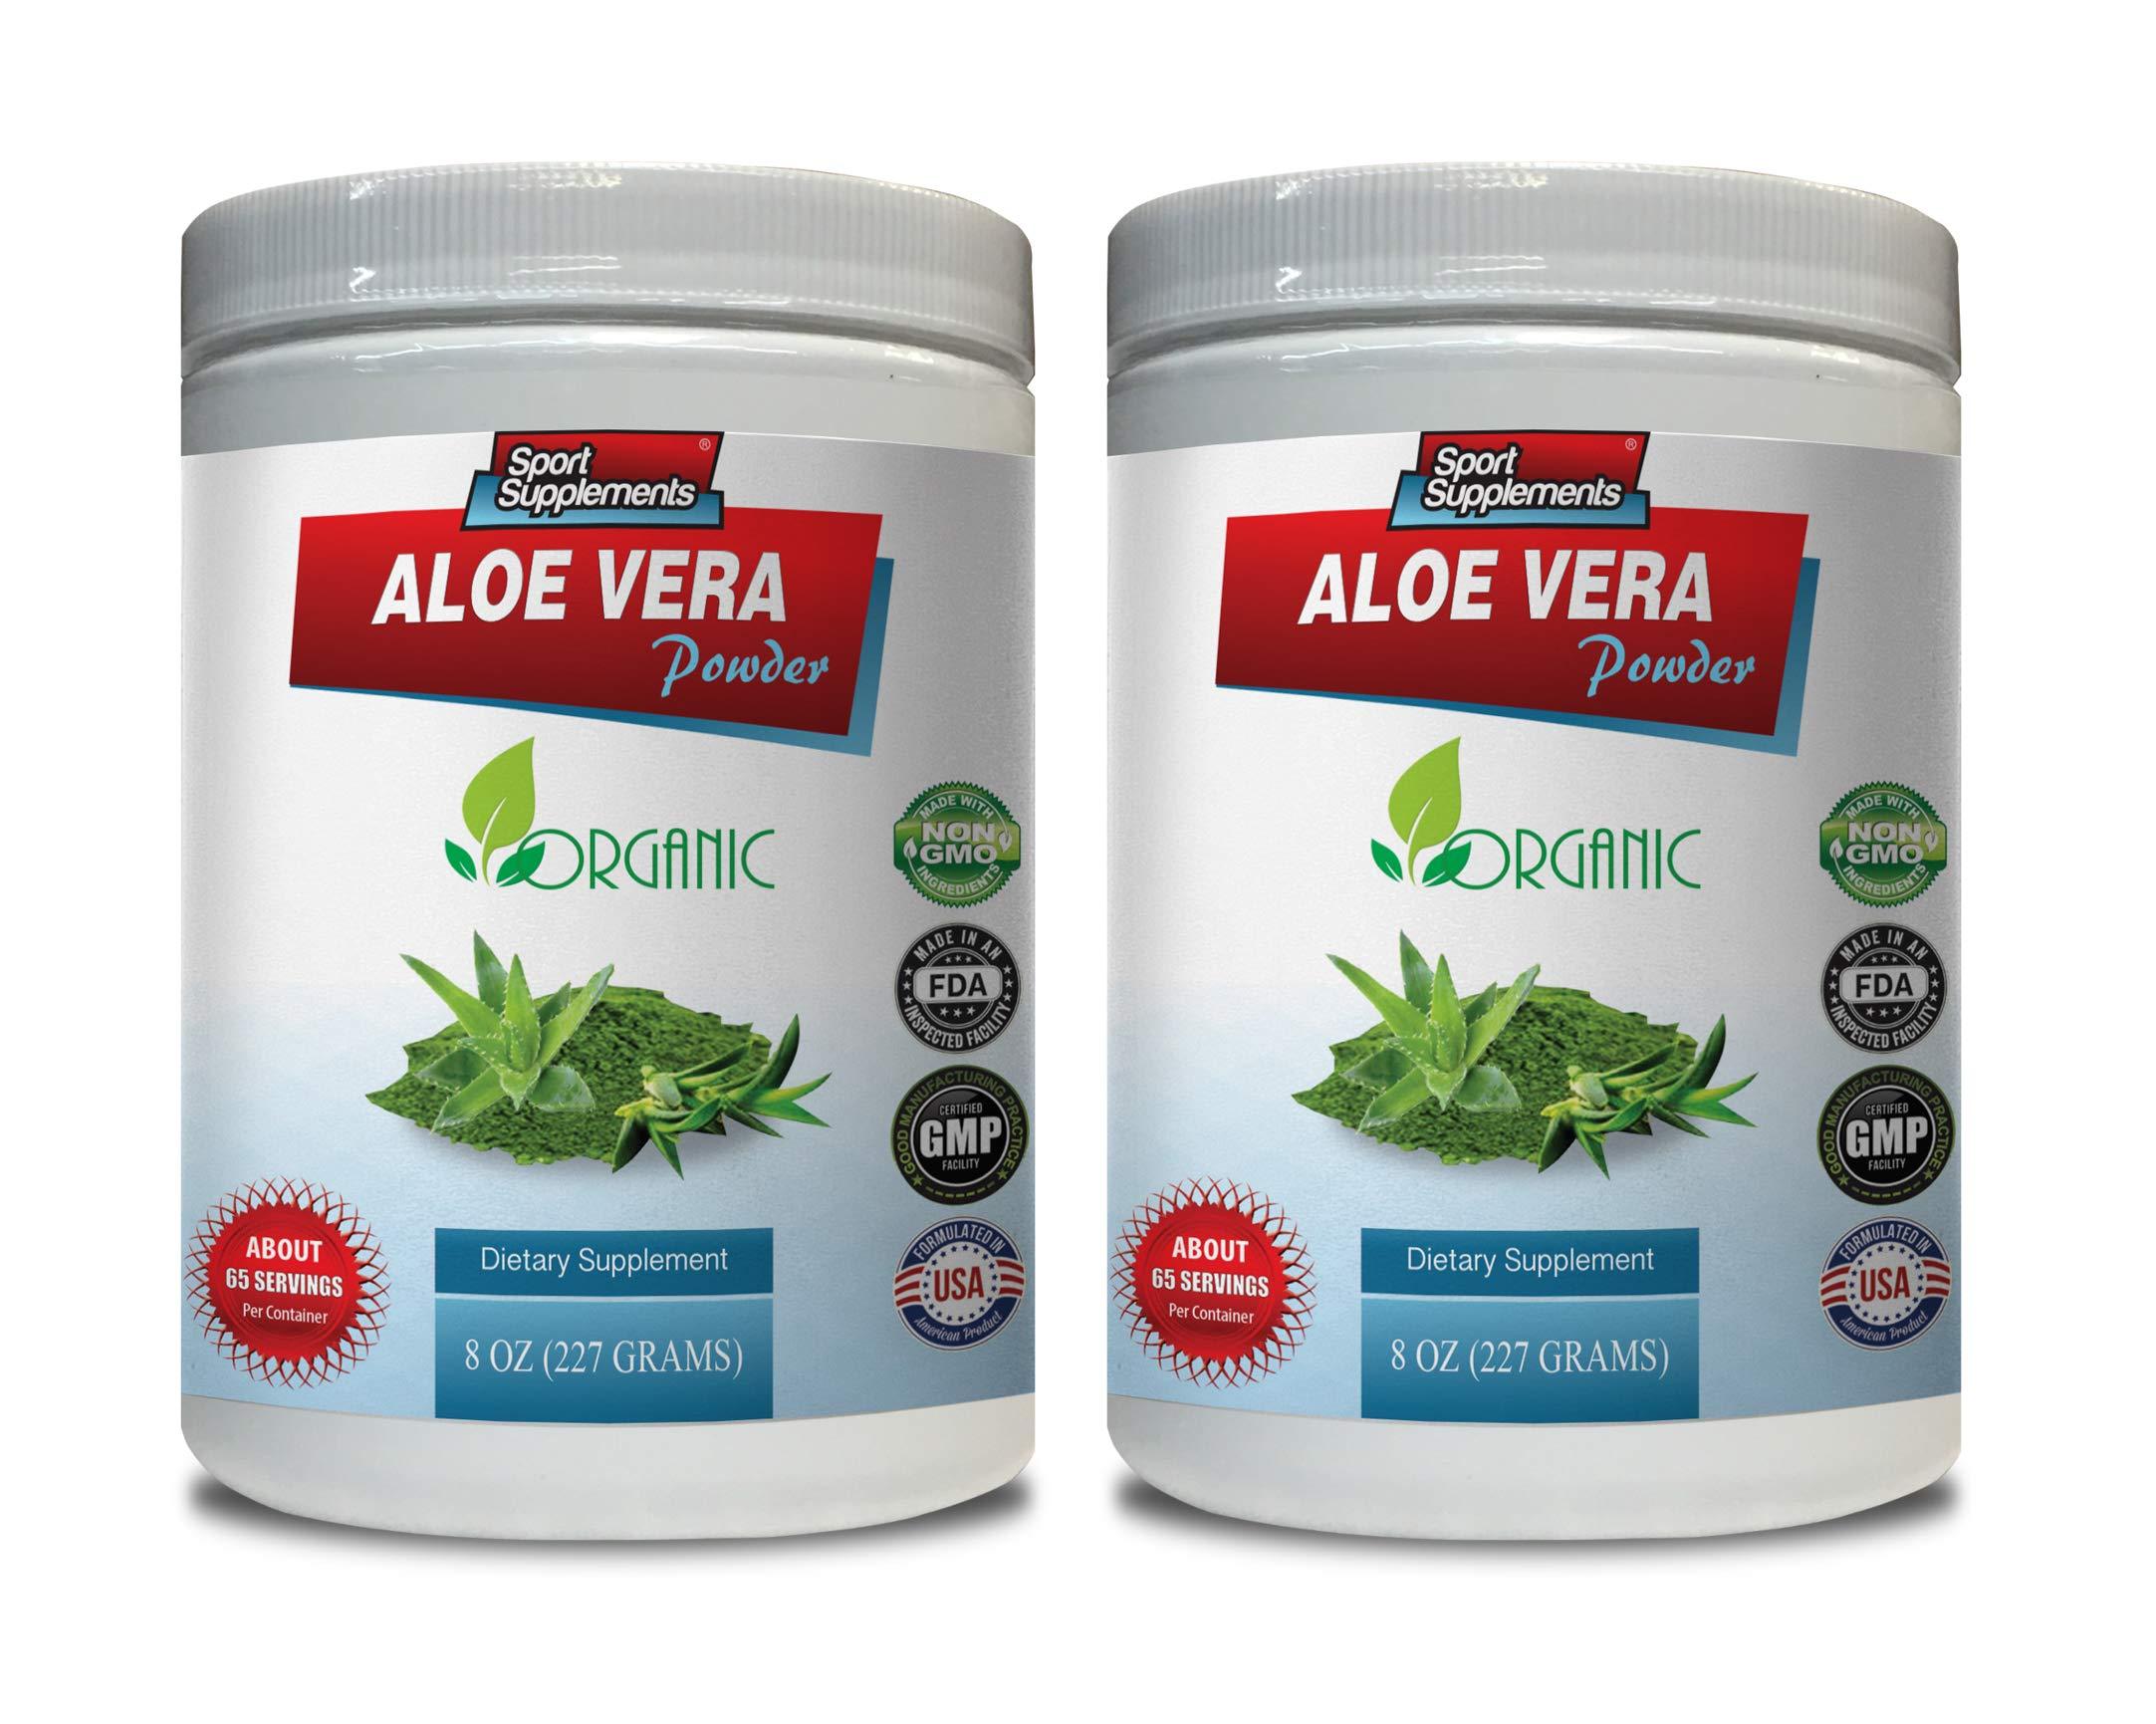 Organic Immune Boosting Supplements - Aloe Vera Powder Organic - Dietary Supplement - Aloe Vera Supplement - 2 Cans 16 OZ (130 Servings)